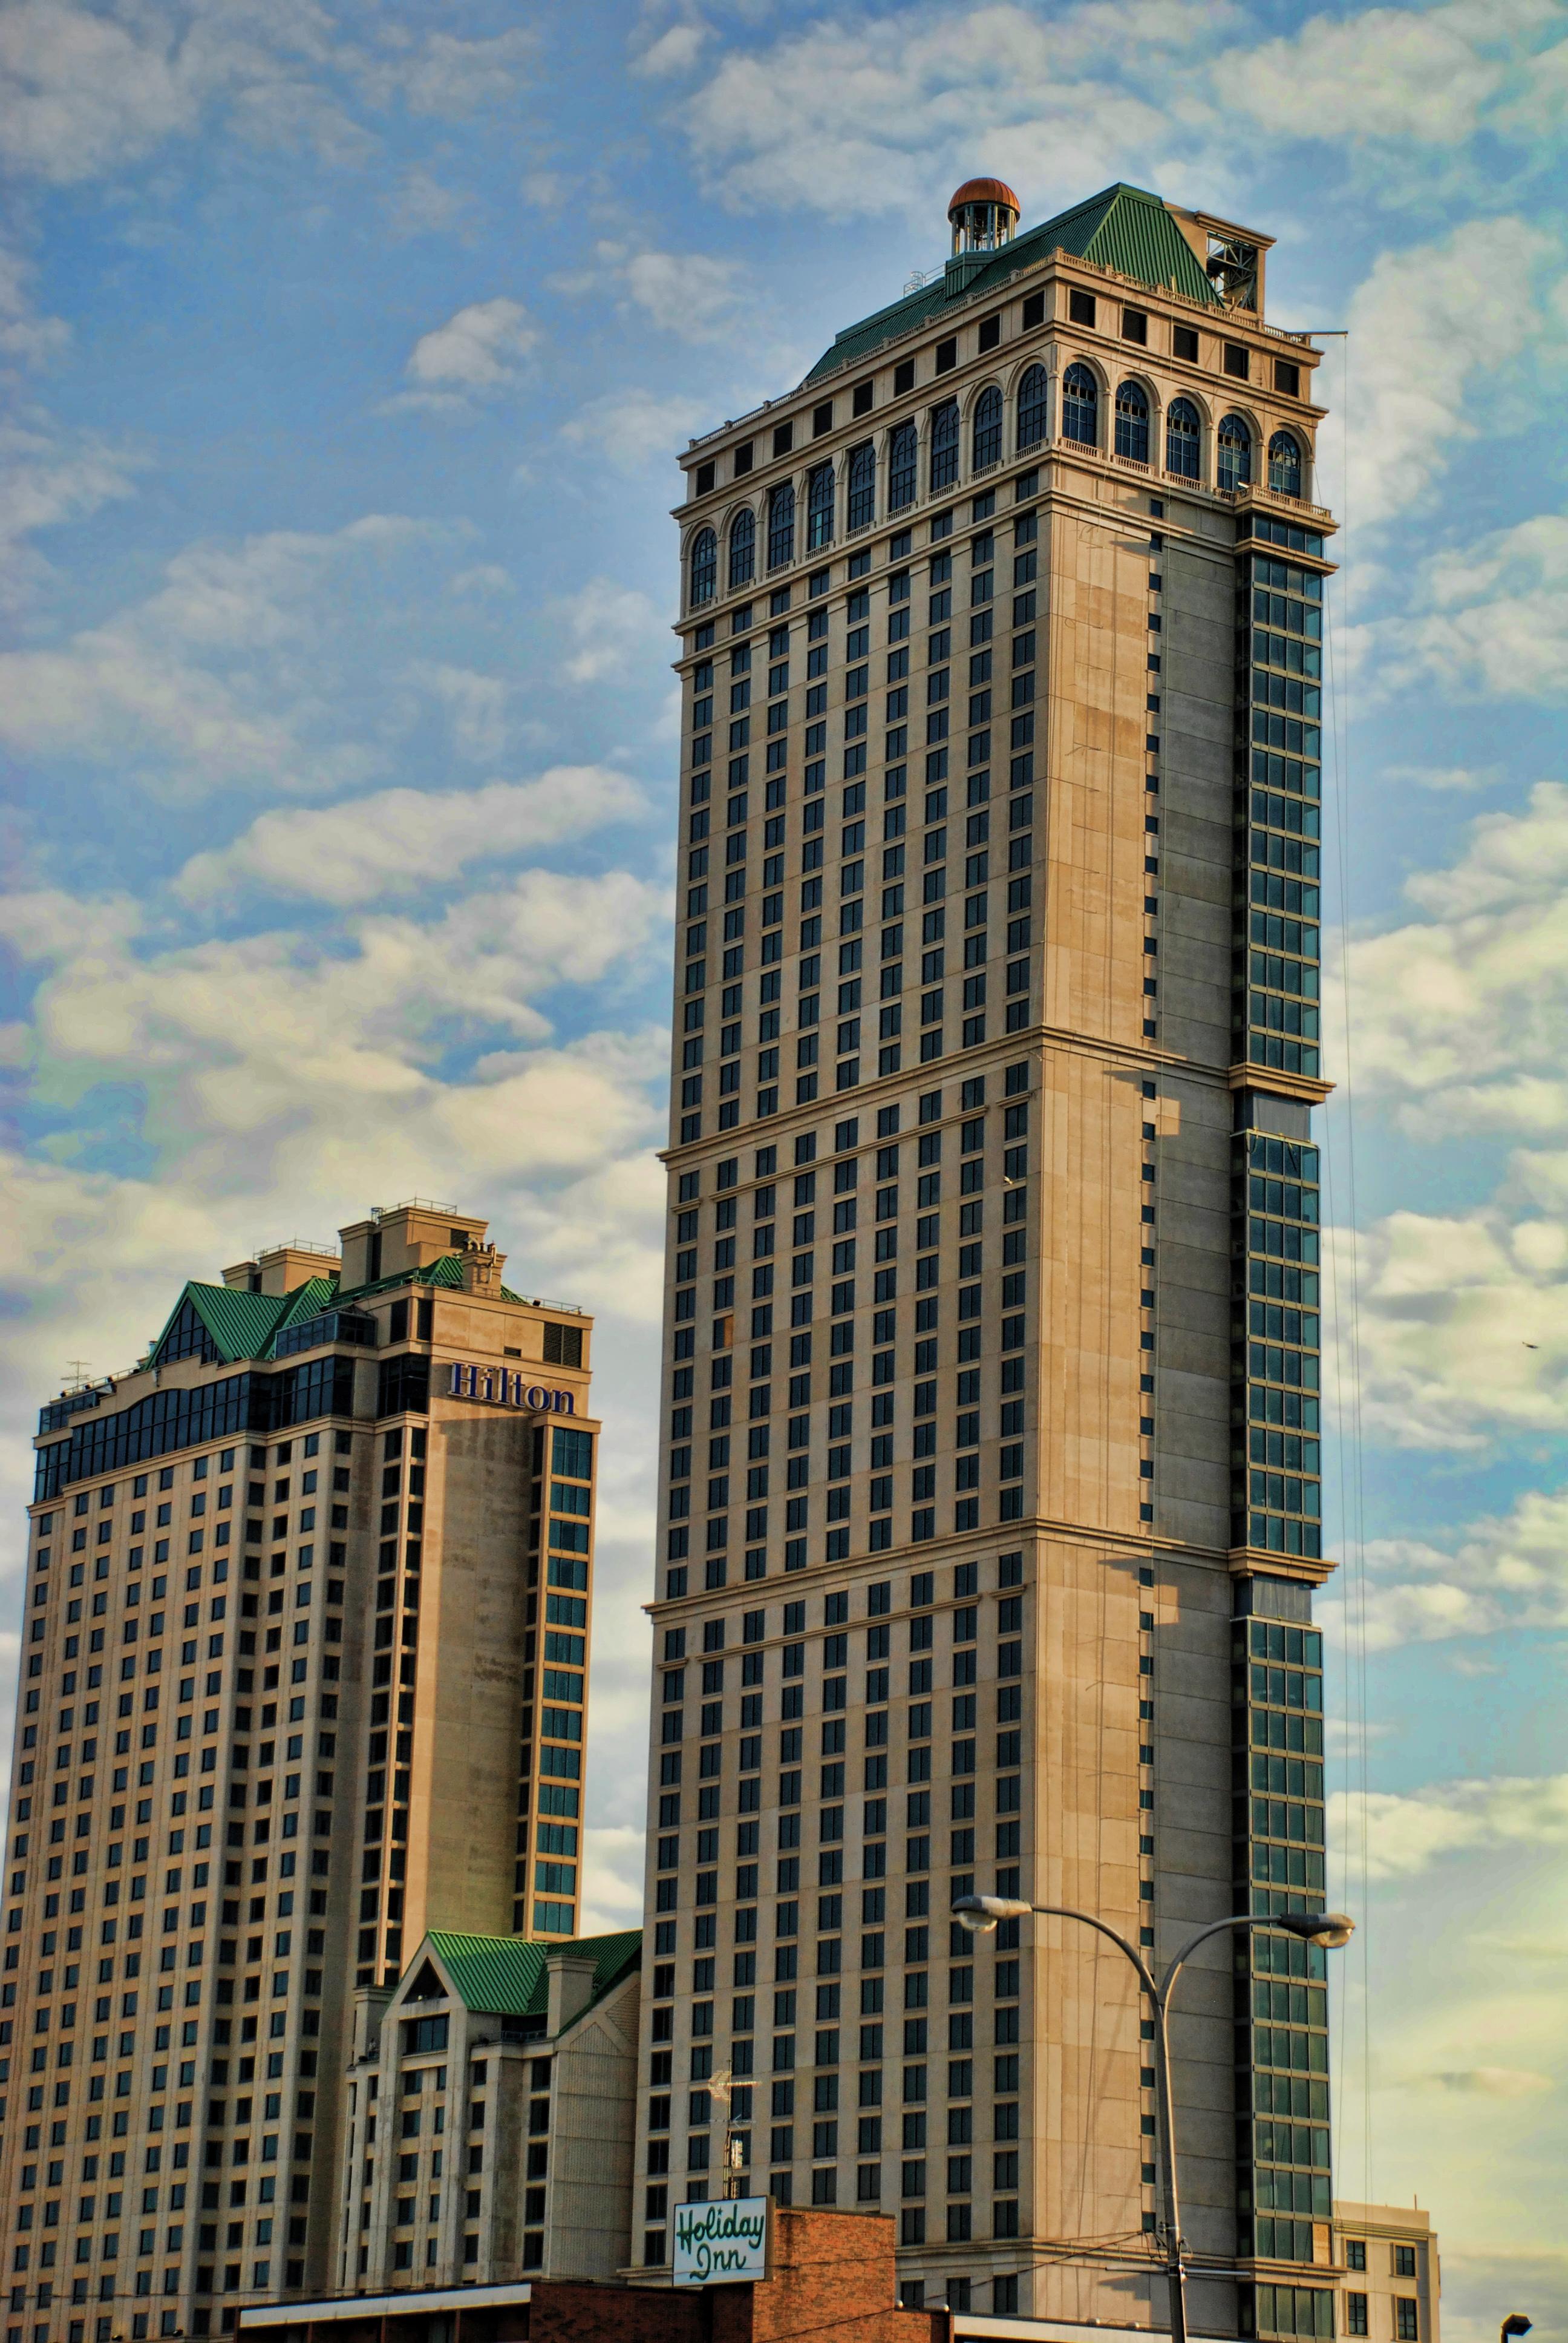 Hilton fallsview casino hotel niagara falls on